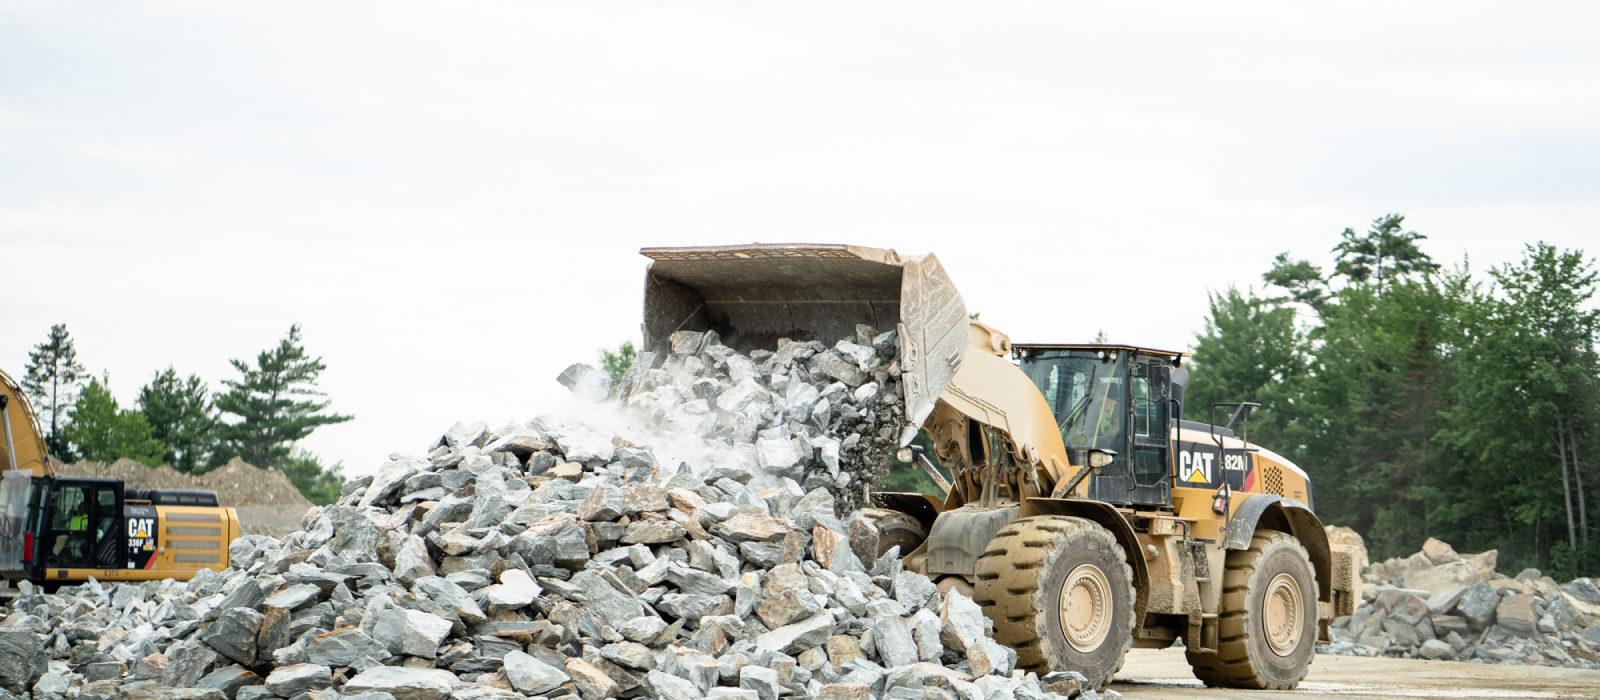 Large Excavators Dumping Pile Of Large Rocks